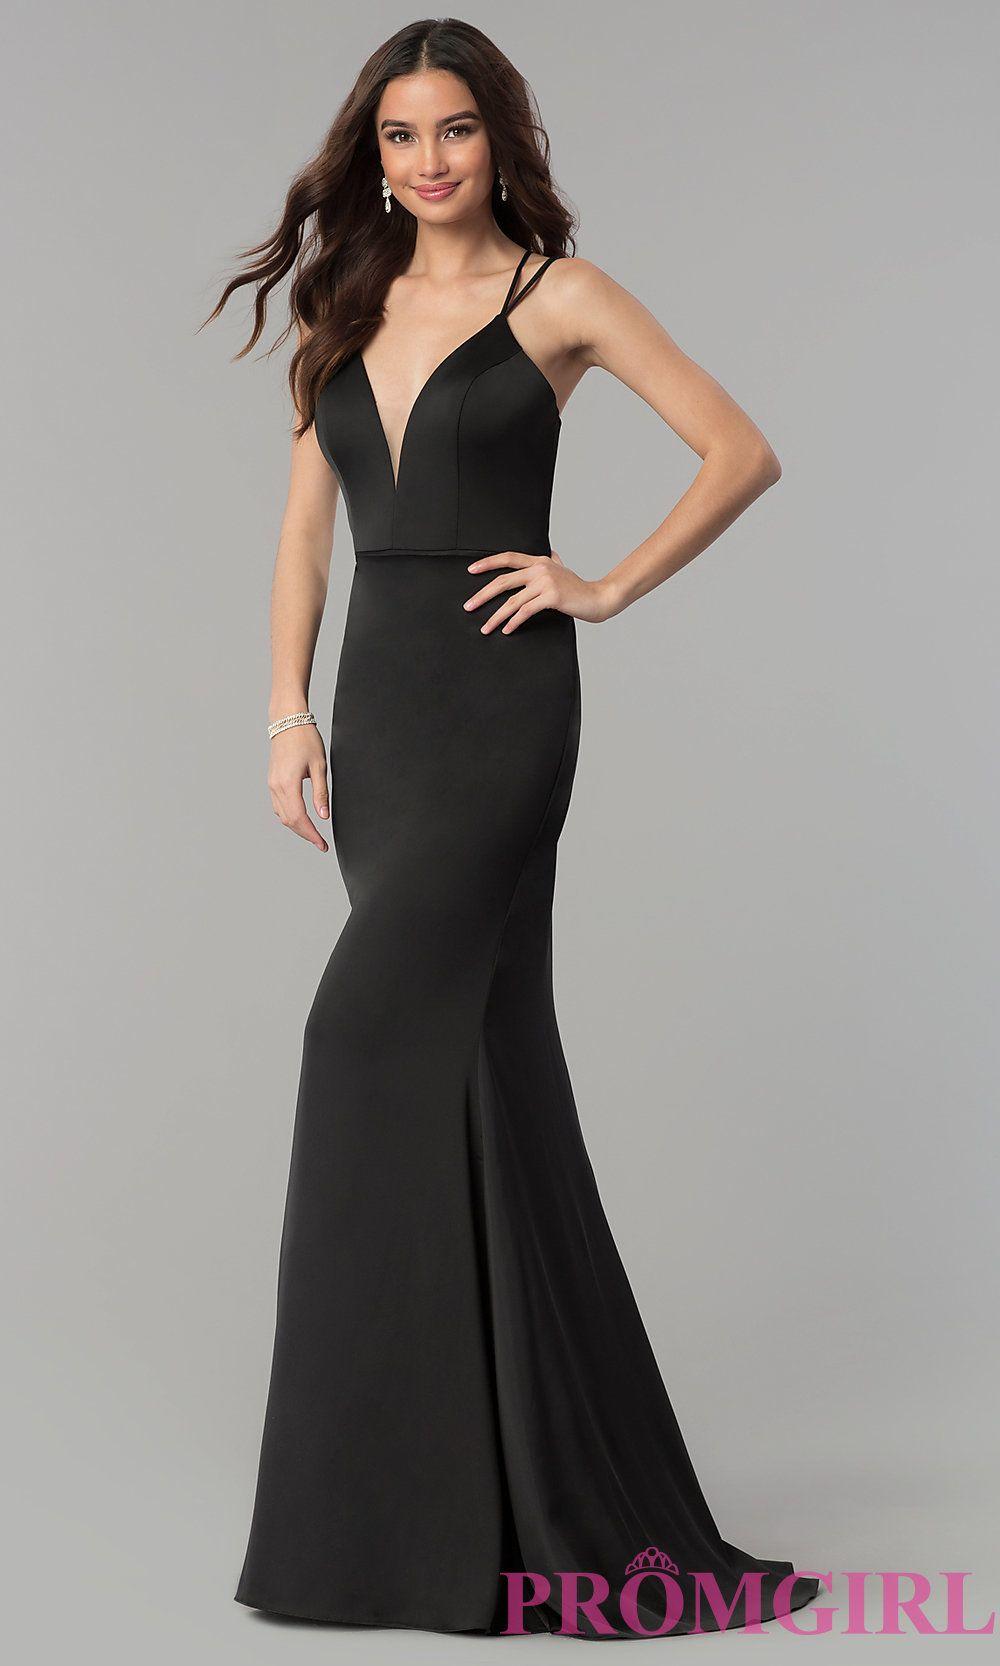 24d35160198 V-Neck Open-Back Long Satin Prom Dress by Faviana in 2019